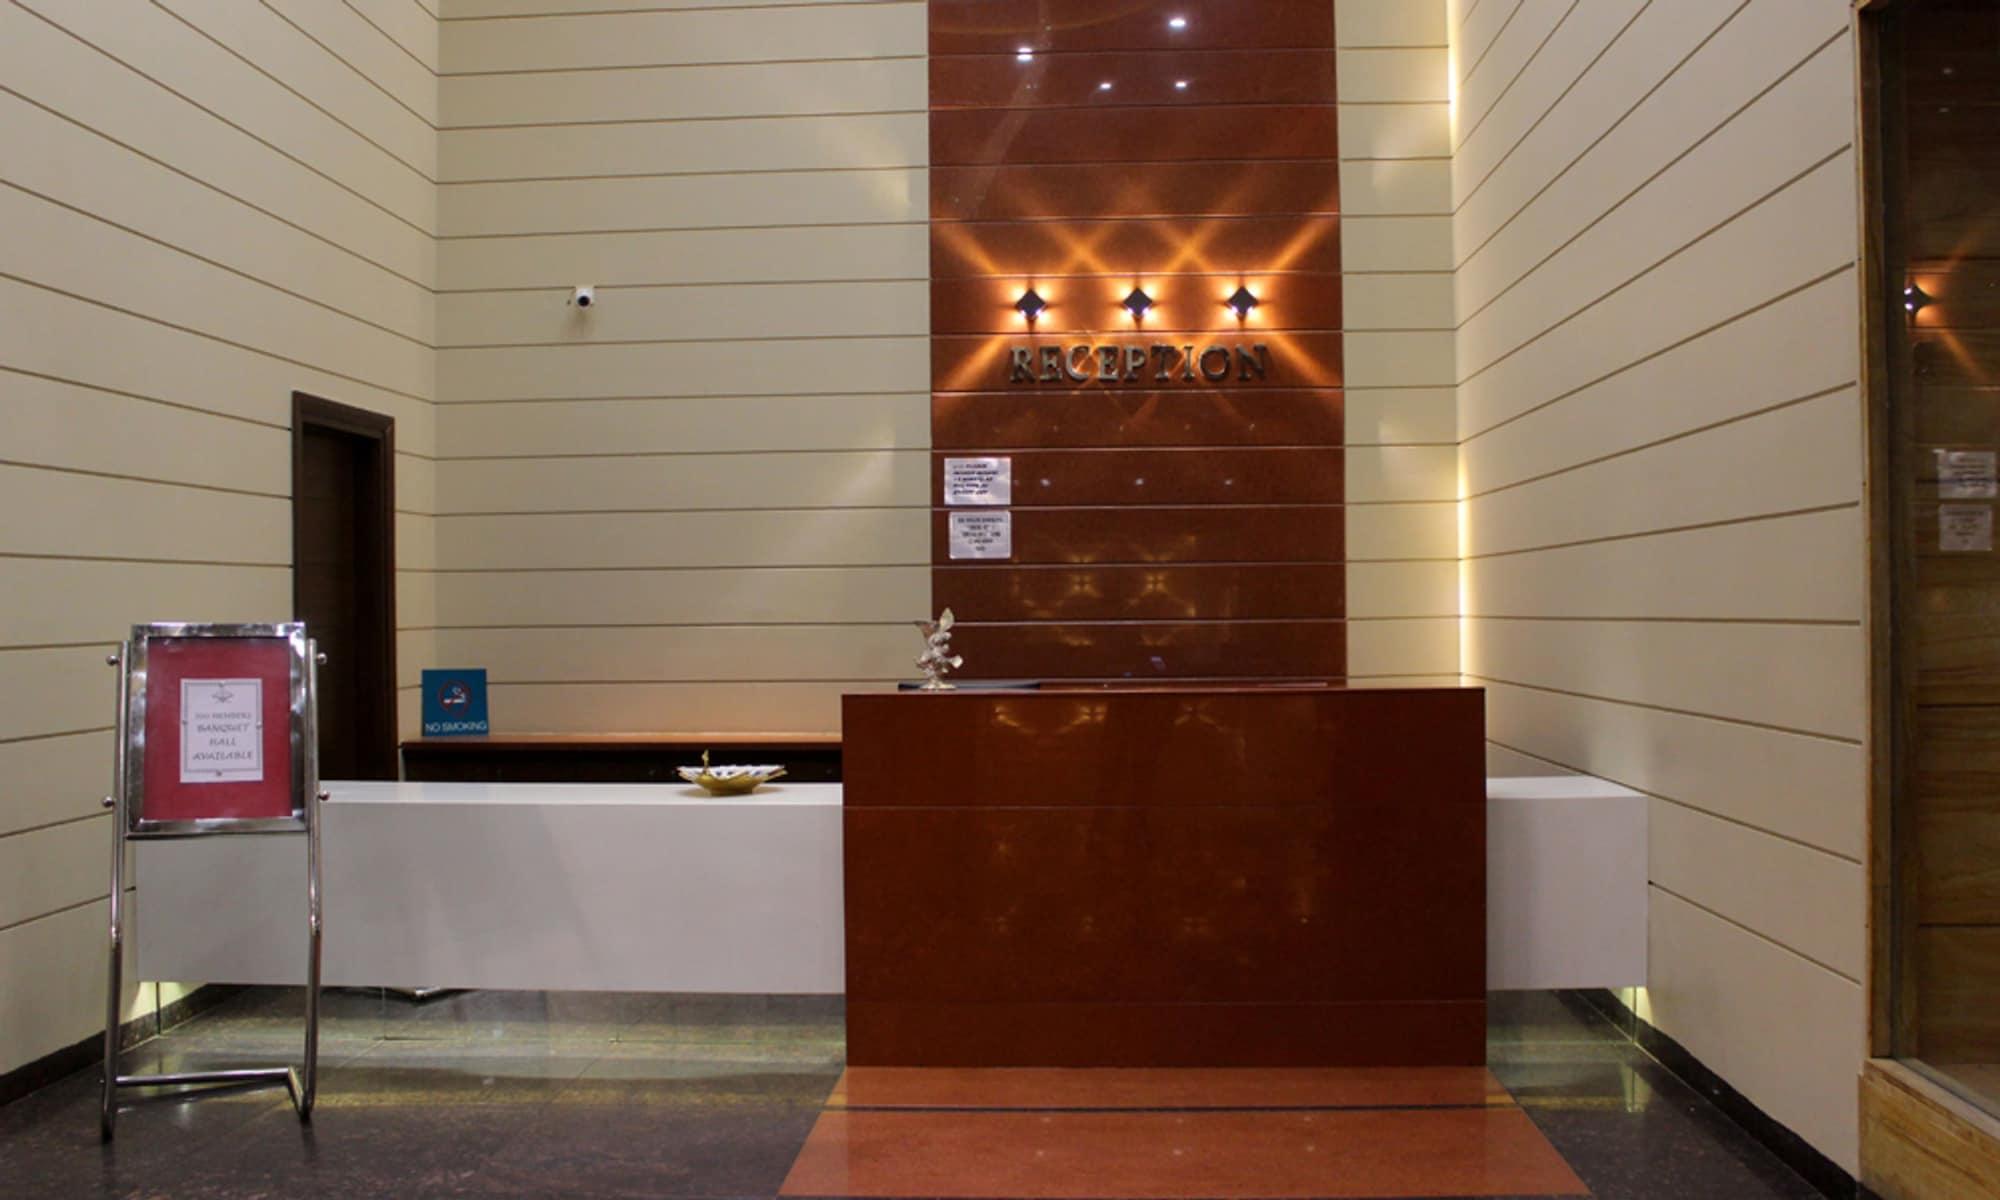 Sign Regency Hotel, Kurnool